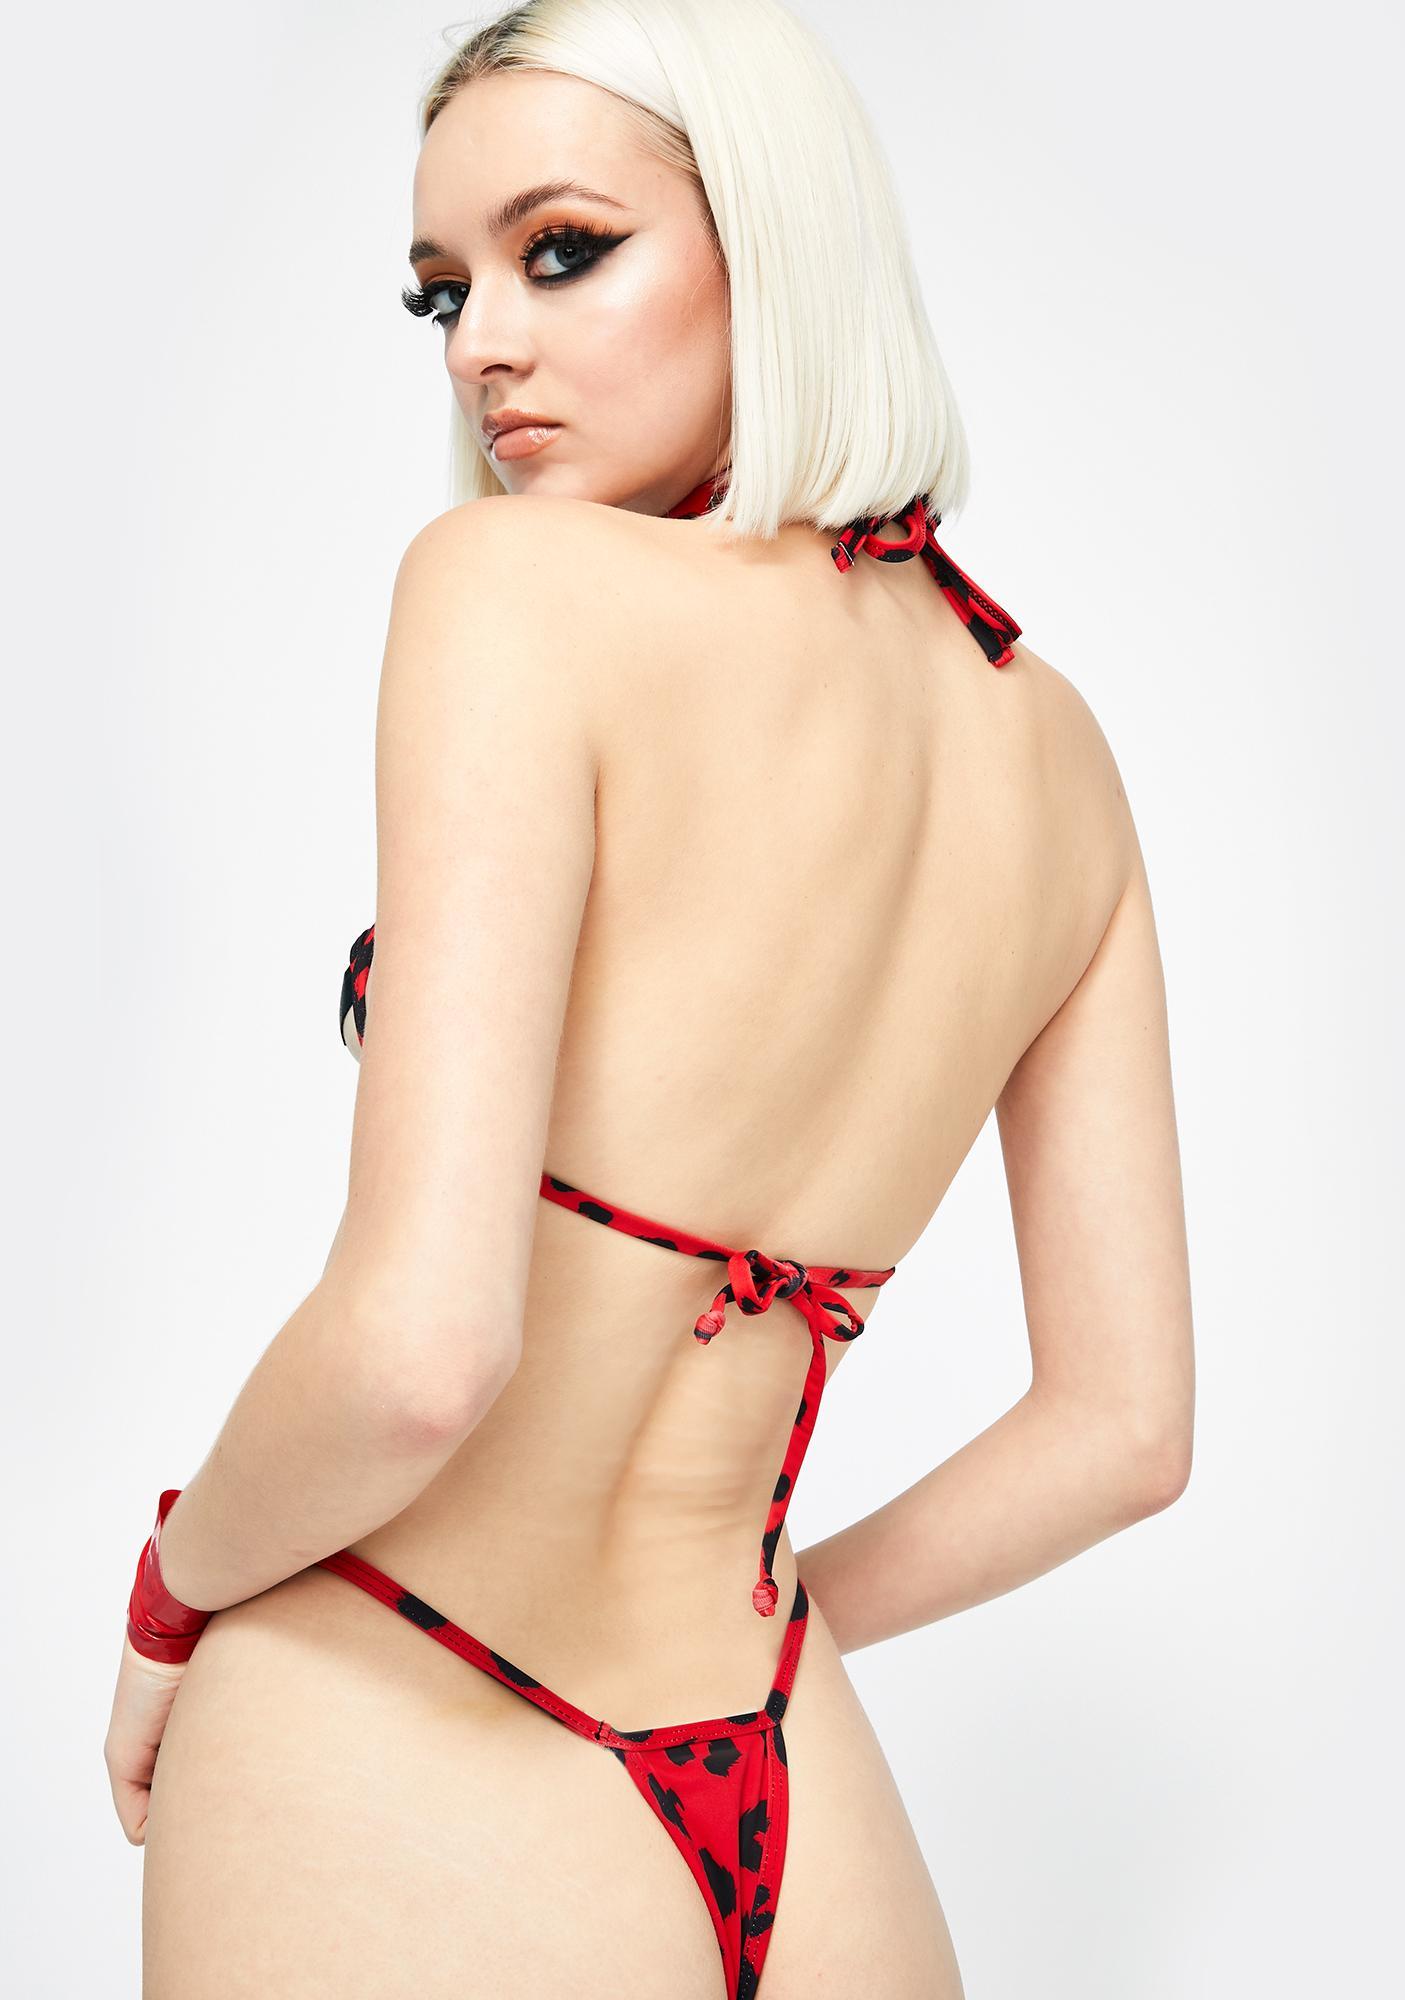 Candy Shop Lingerie The Kiera Cut-Out Bikini Set